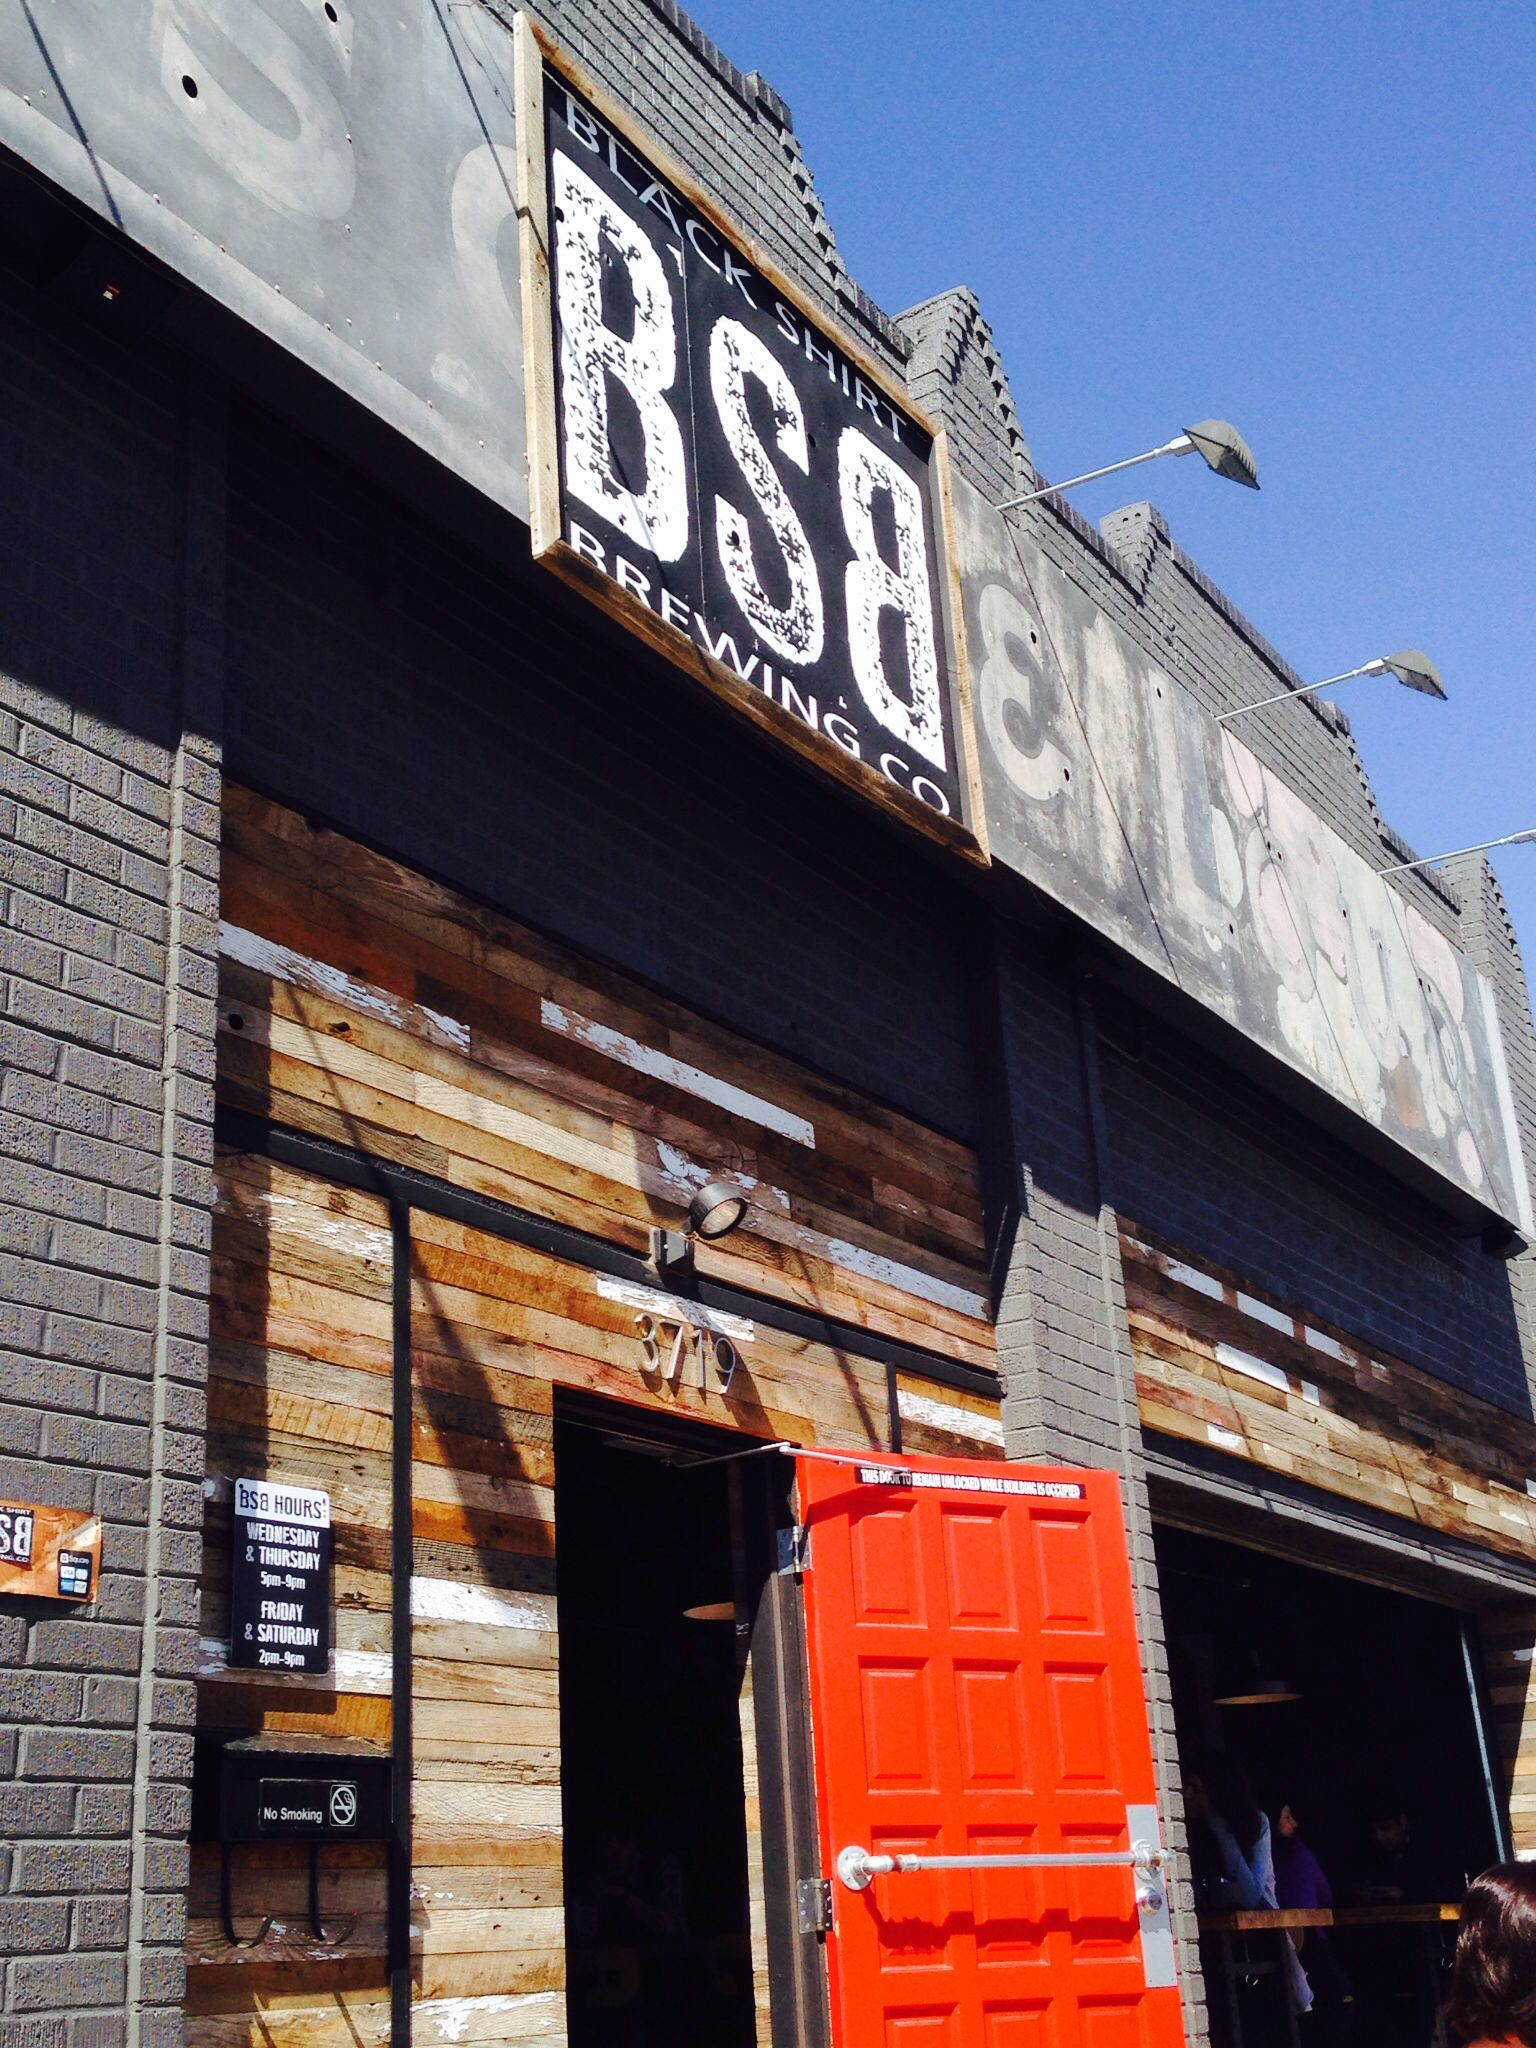 Black Shirt Brewery. Denver. | Places | Pinterest | Shirts, Black ...